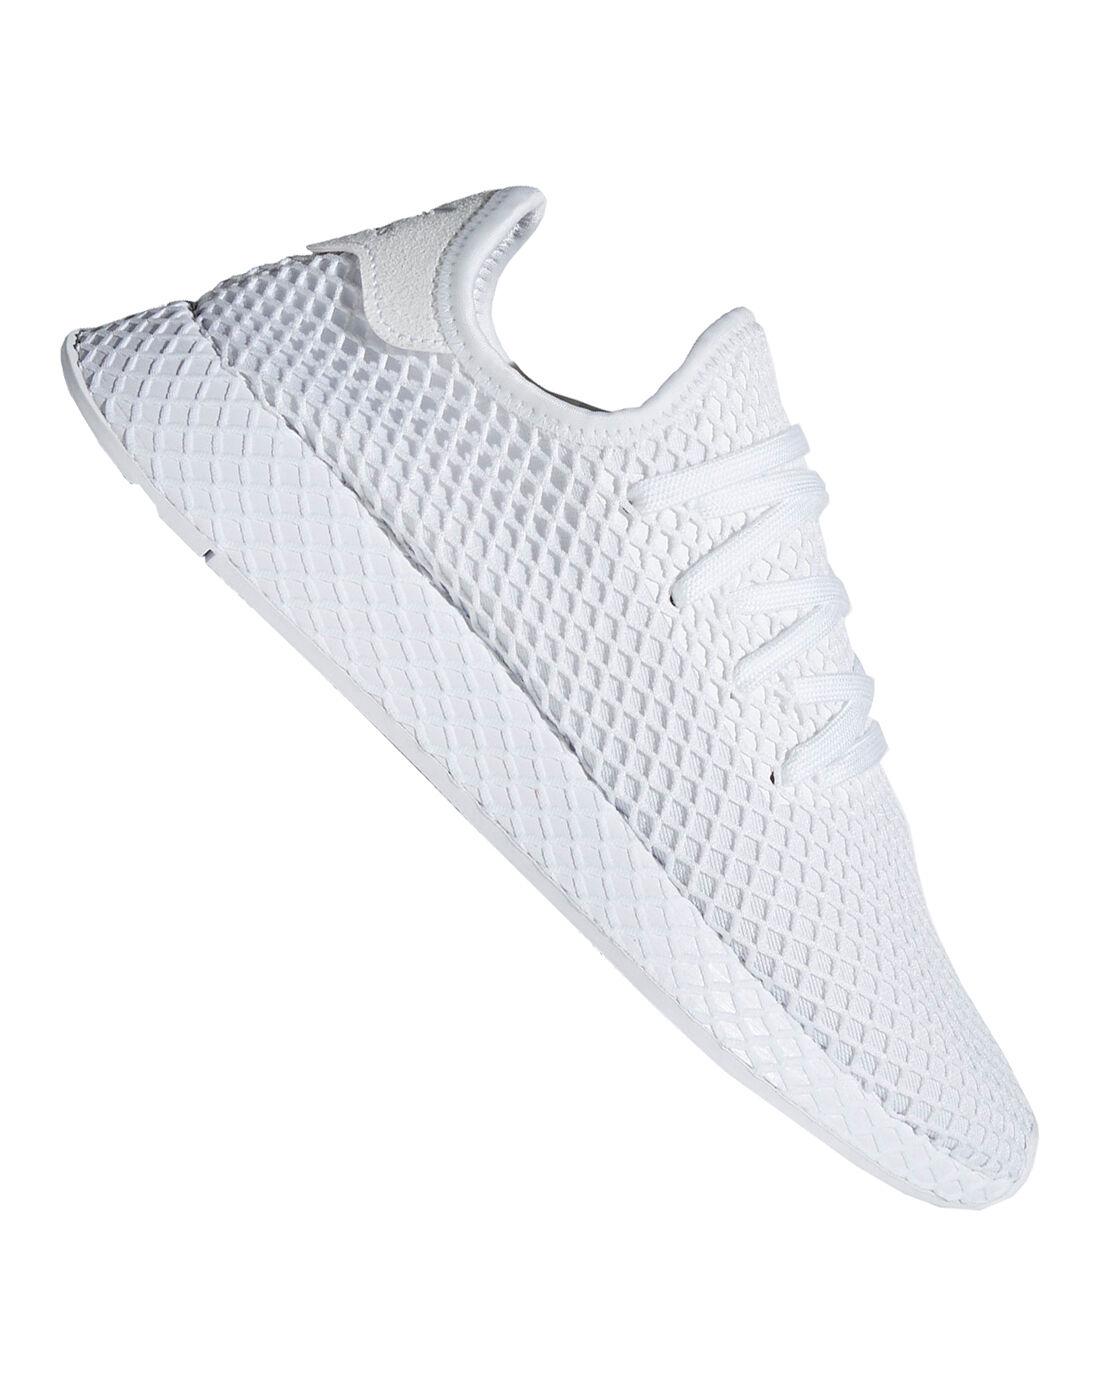 Mens adidas Originals Deerupt | White